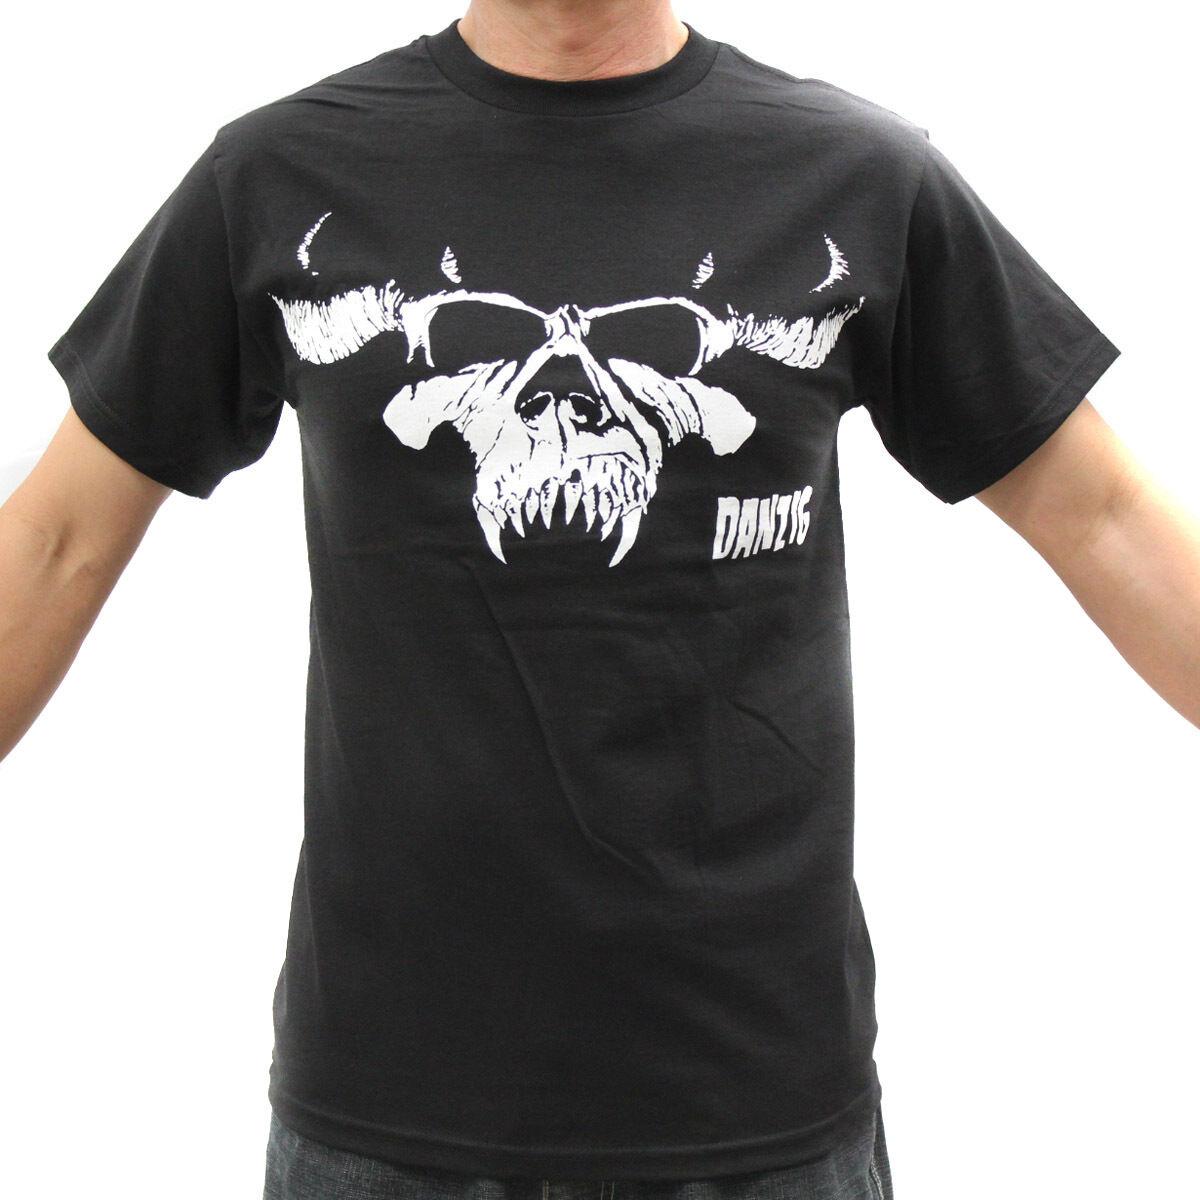 Danzig Punk Band Graphic T-Shirt